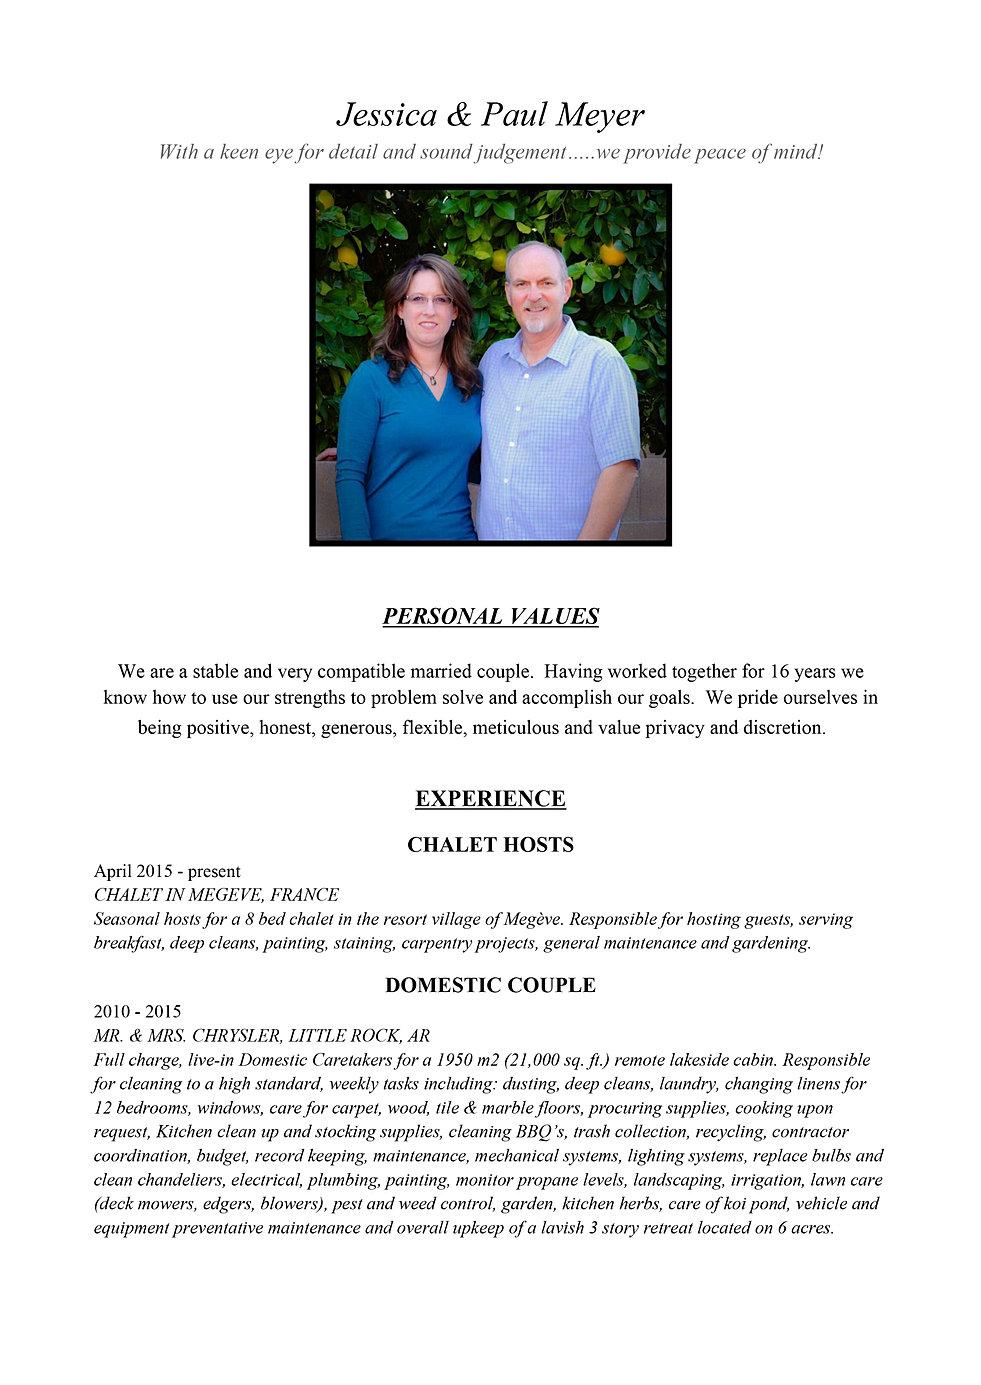 property caretaker couple cv resumes cv resume